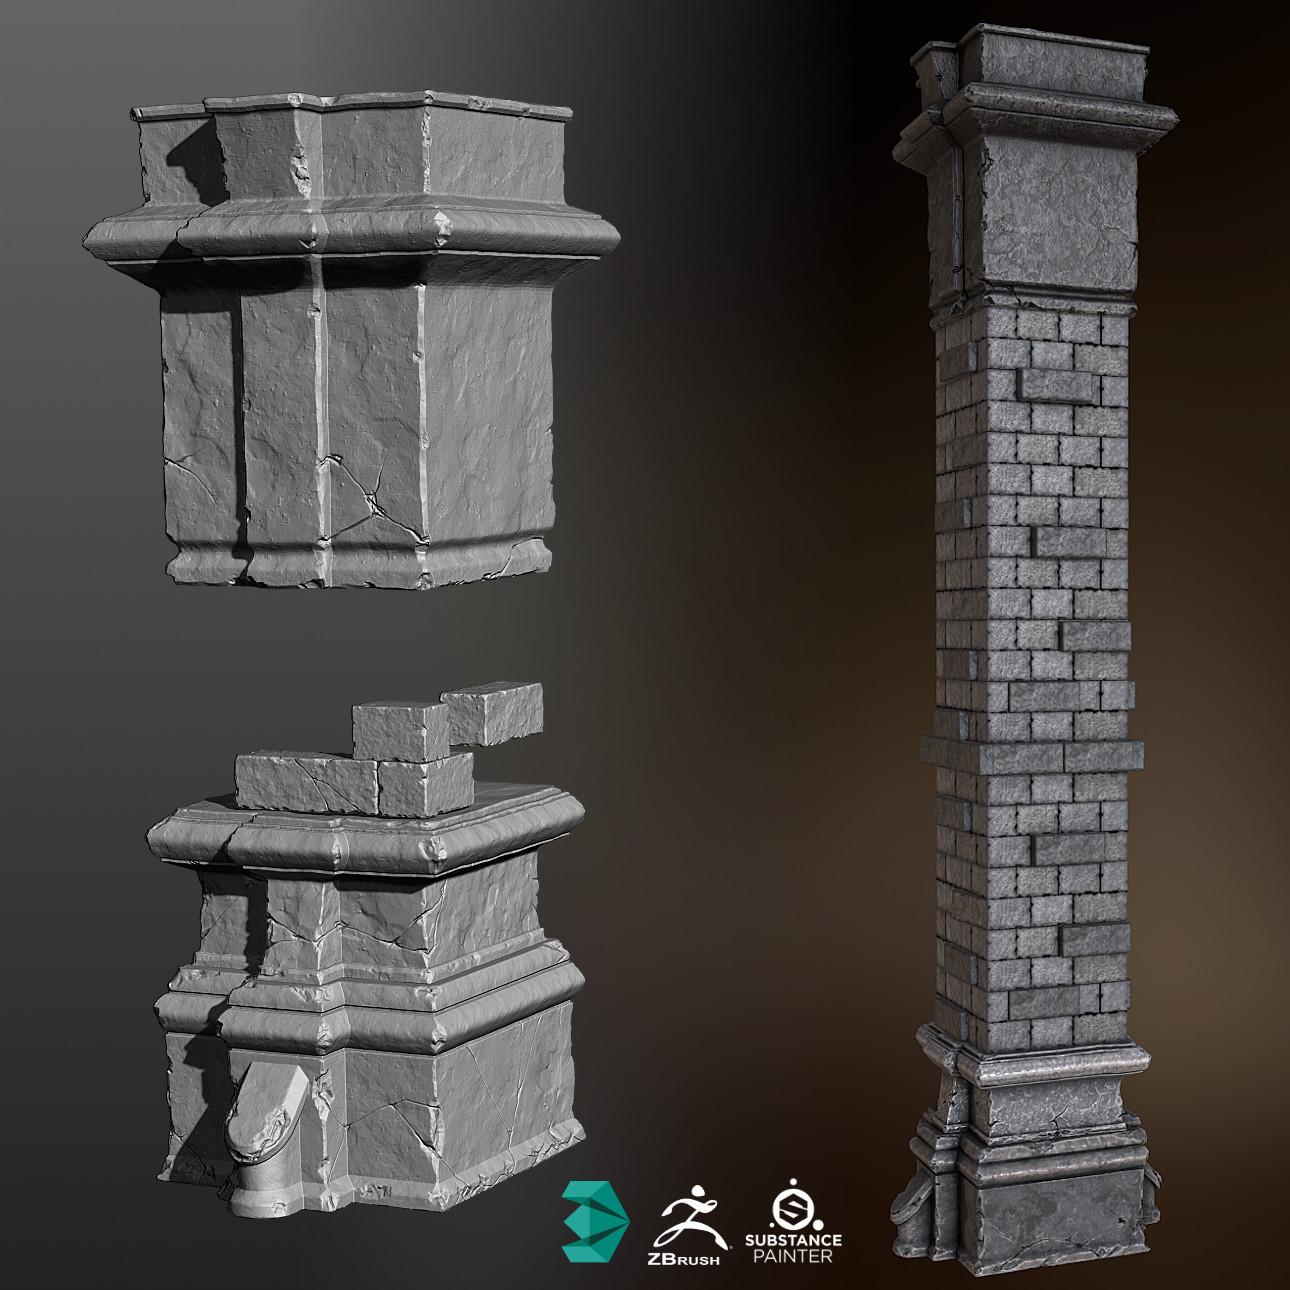 Construction Of A Stone Pillar : Artstation stone brick pillar lauri tolppa